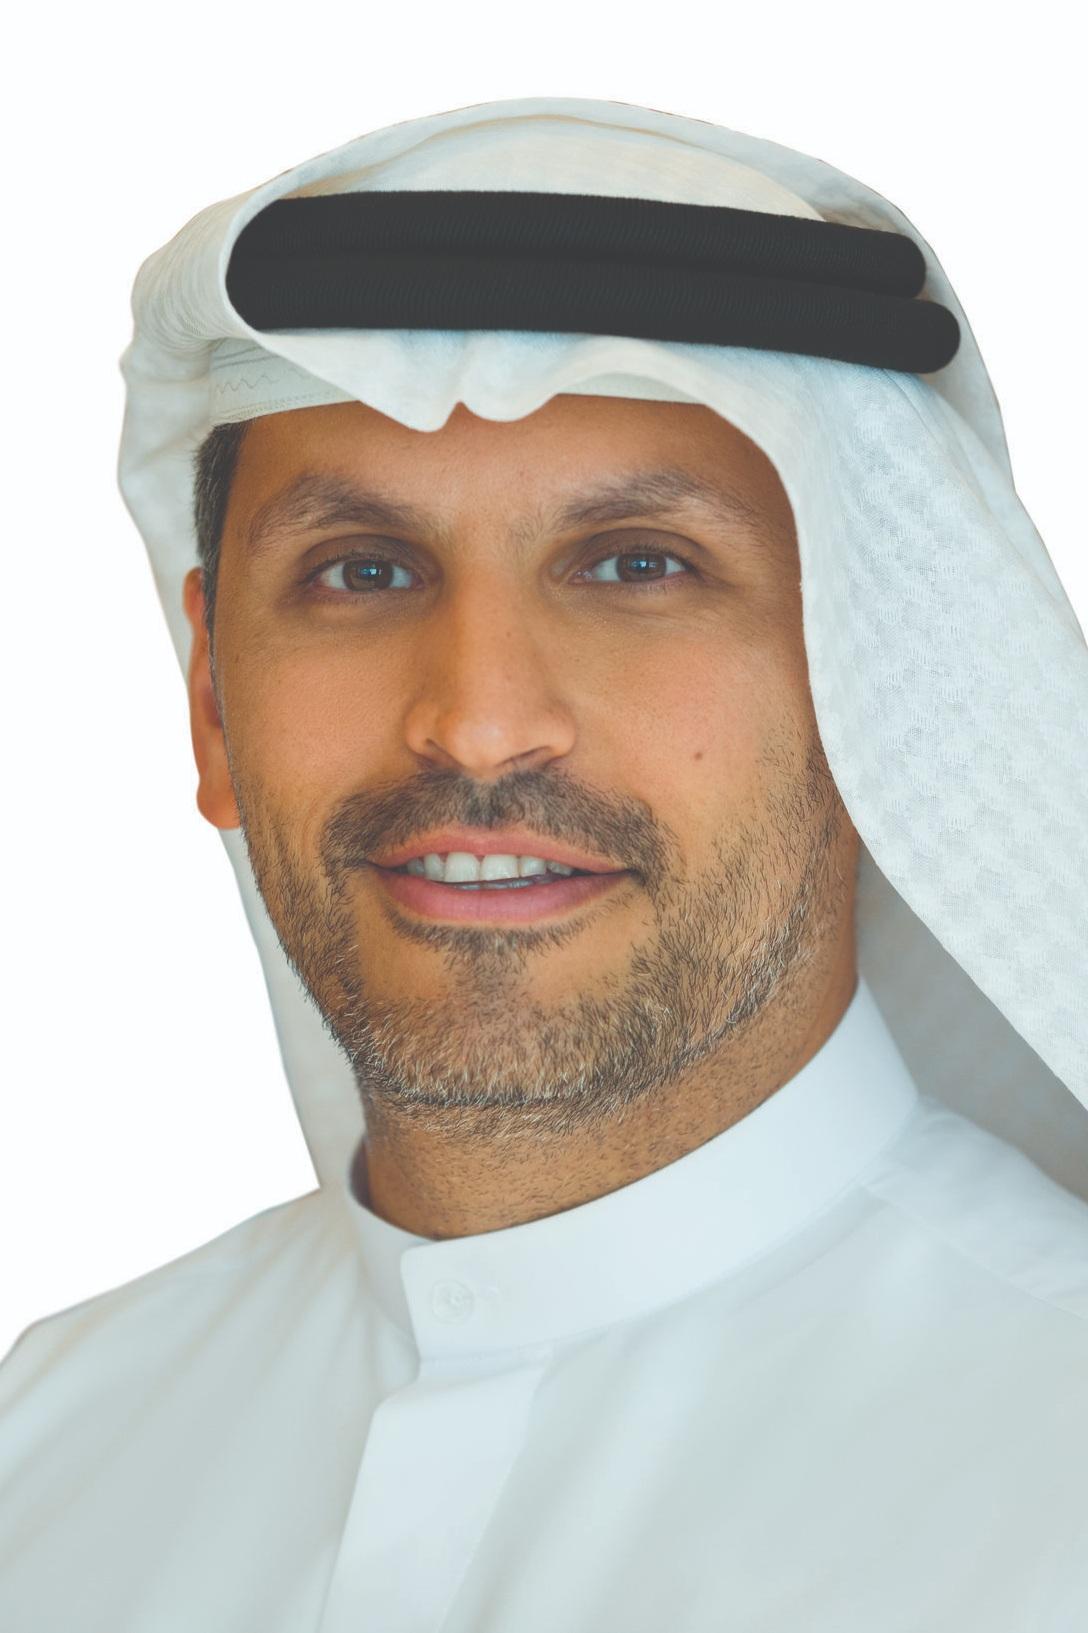 H.E. KHALDOON KHALIFA AL MUBARAK   Mubadala Investment Company  Managing Director & Group Chief Executive Officer